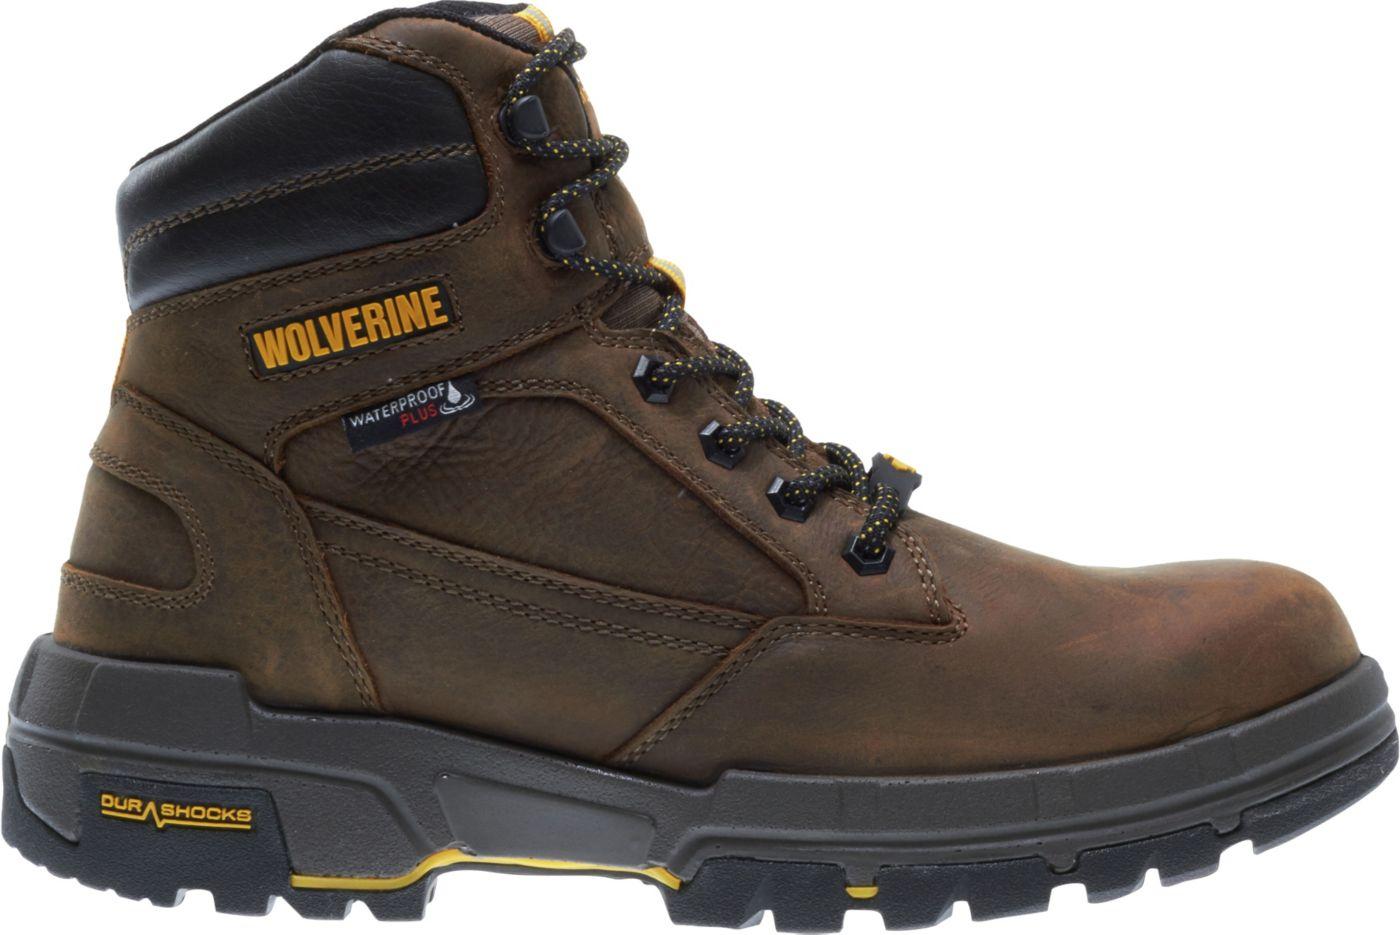 Wolverine Men's Legend LX 6'' DuraShocks CarbonMAX Waterproof Composite Toe Work Boots